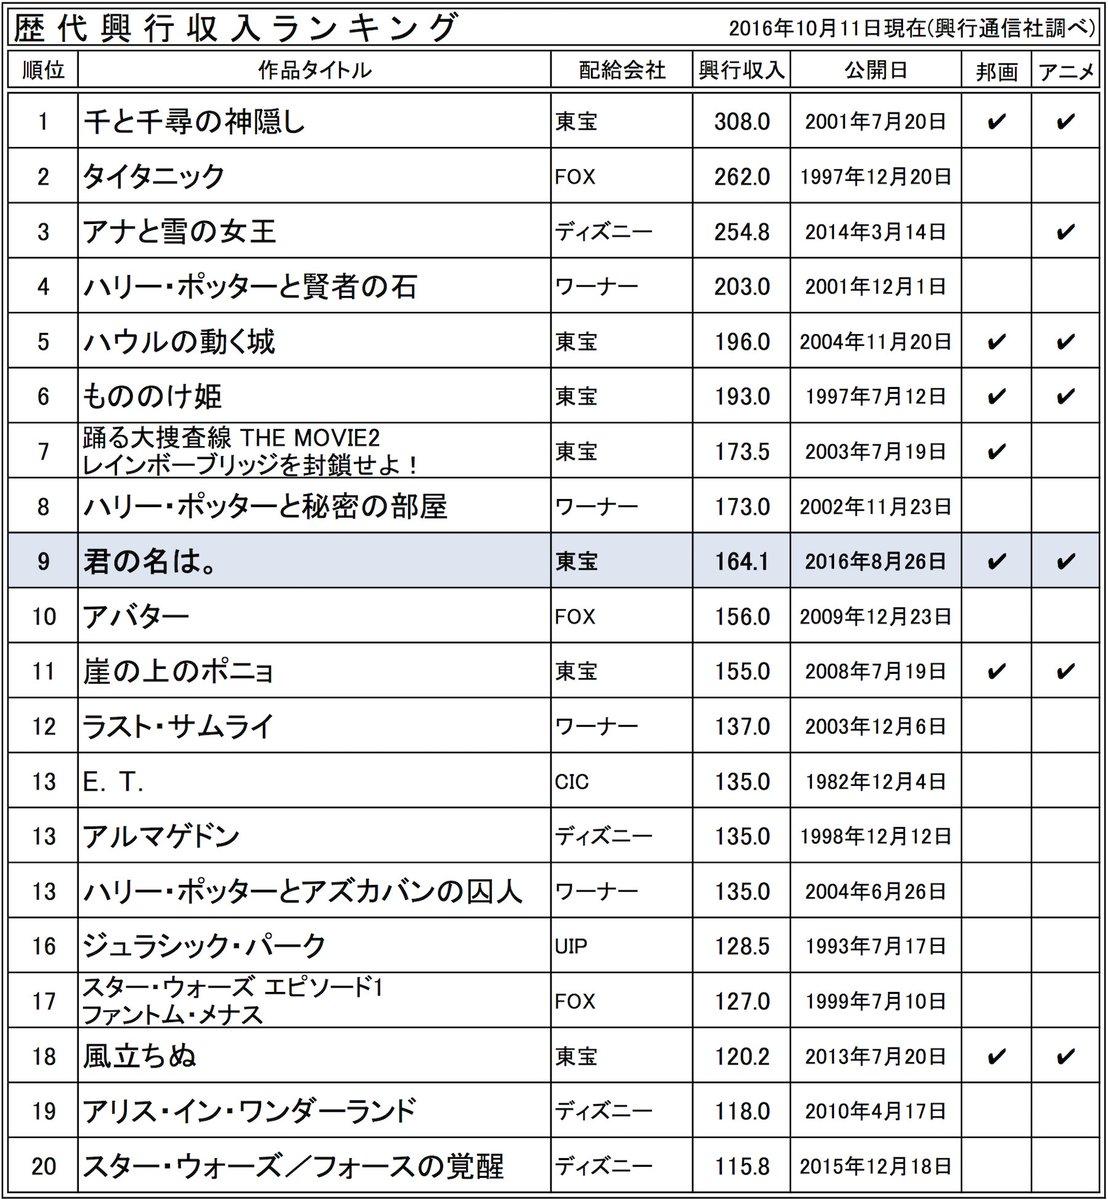 RADWIMPSが主題歌4曲と劇伴22曲の全てを制作した、新海誠監督のアニメ映画「君の名は。」()、週末の観客動員数ラン